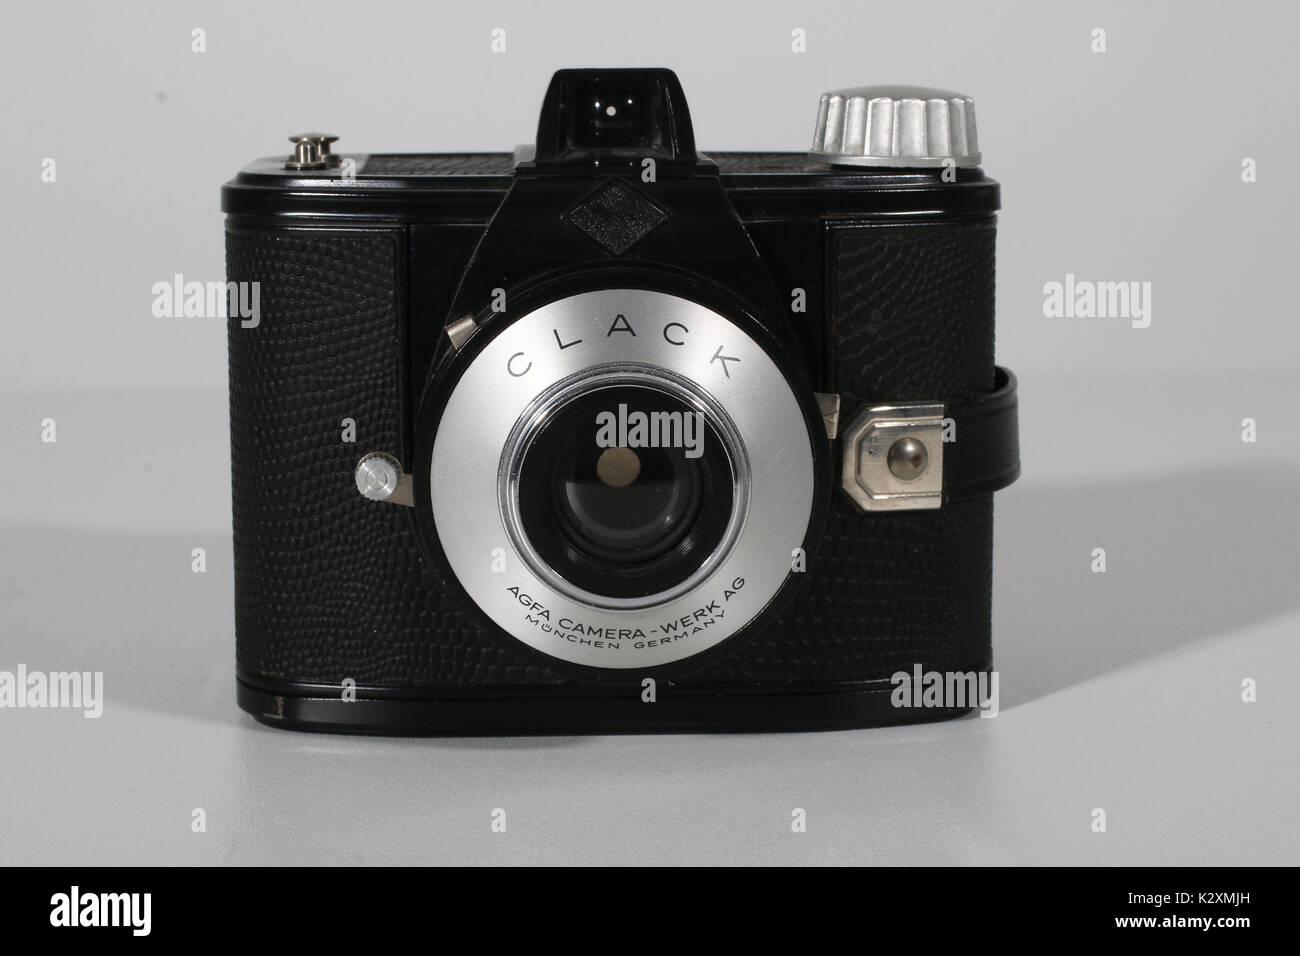 Kamera, Fotoapparat, fotografieren, historisch, Foto, Agfa, Clack, historisch, Rollfilm - Stock Image